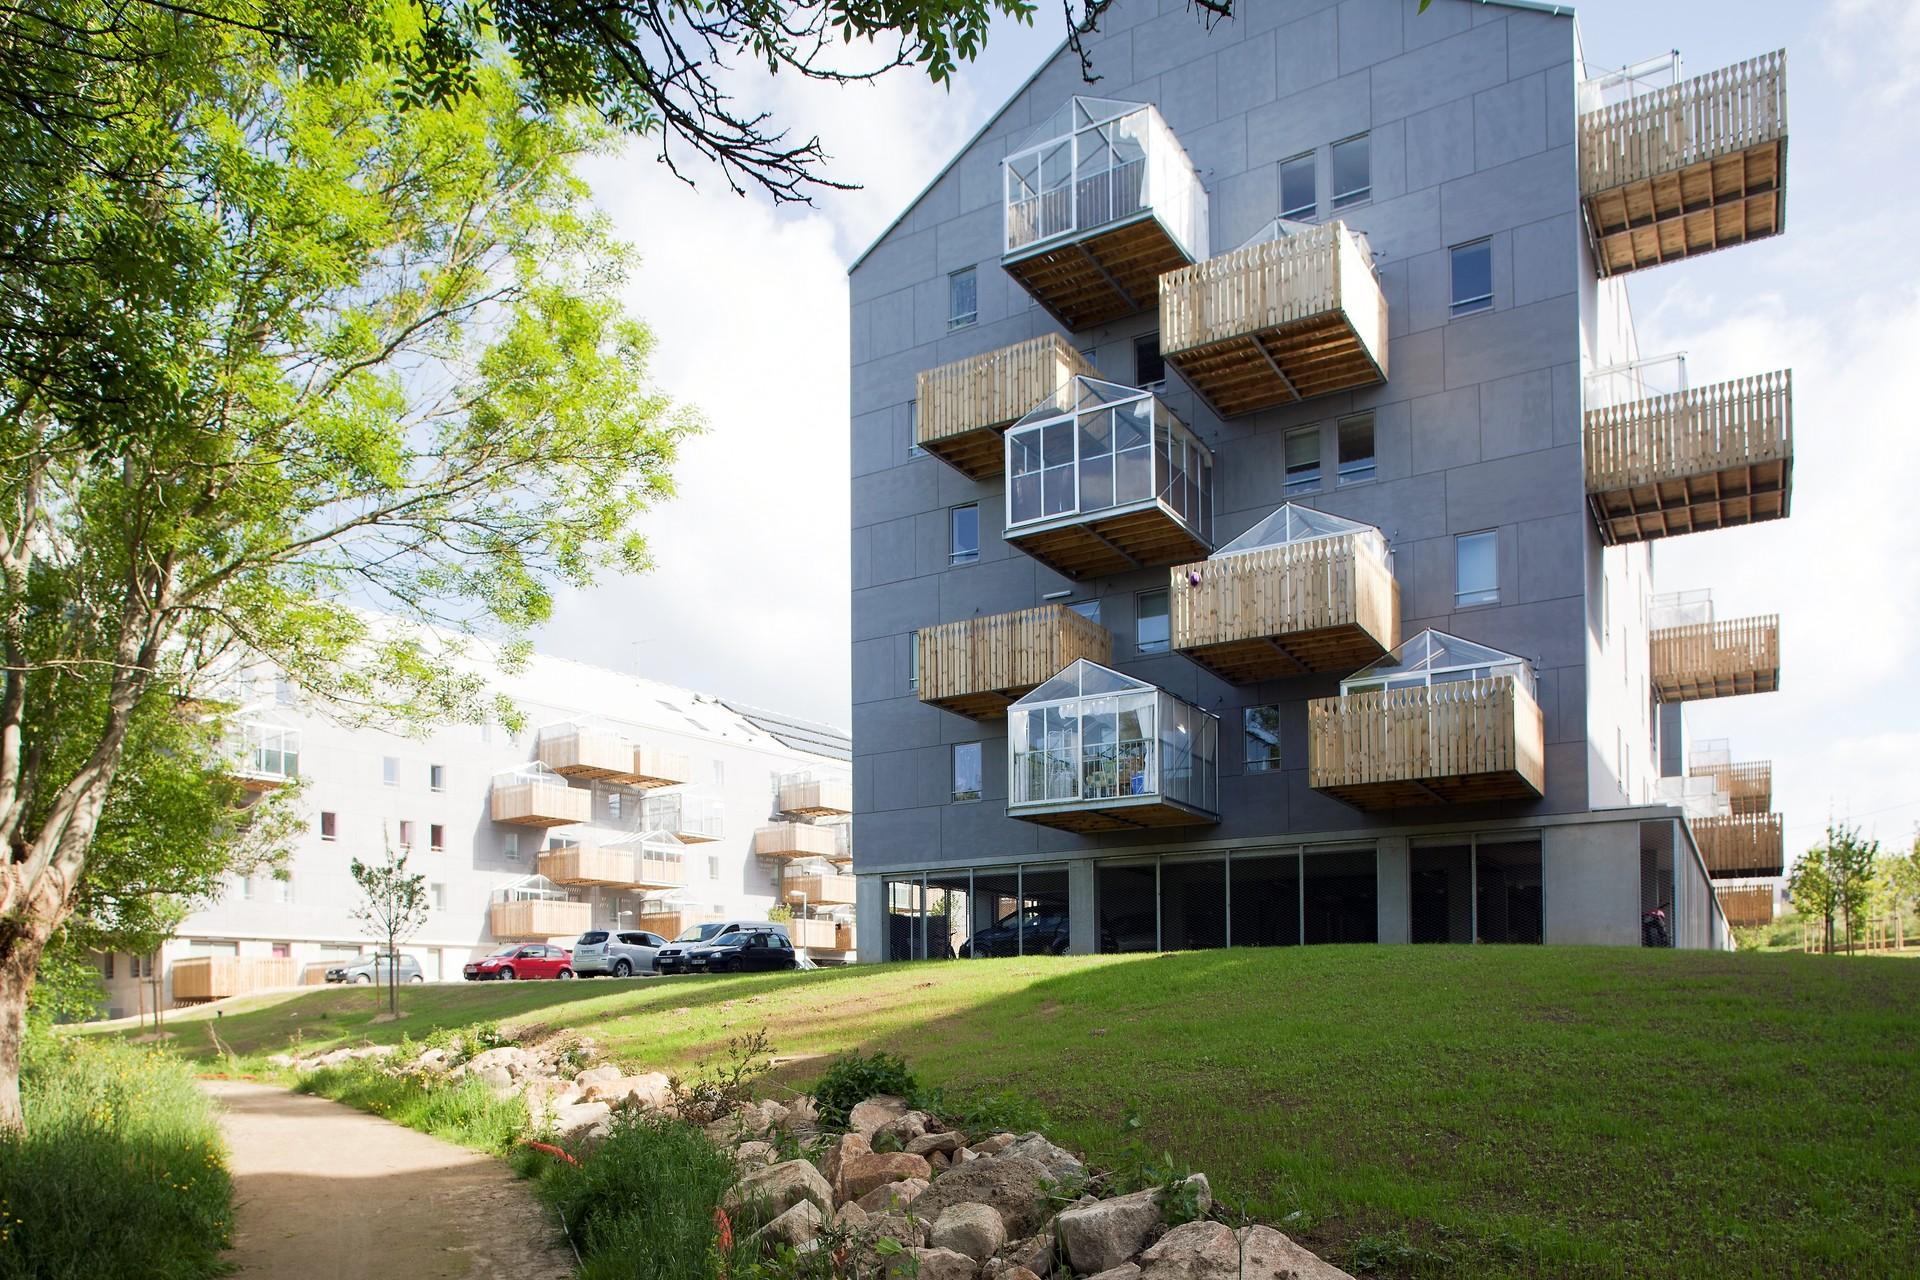 pradenn housing block architectes archdaily. Black Bedroom Furniture Sets. Home Design Ideas